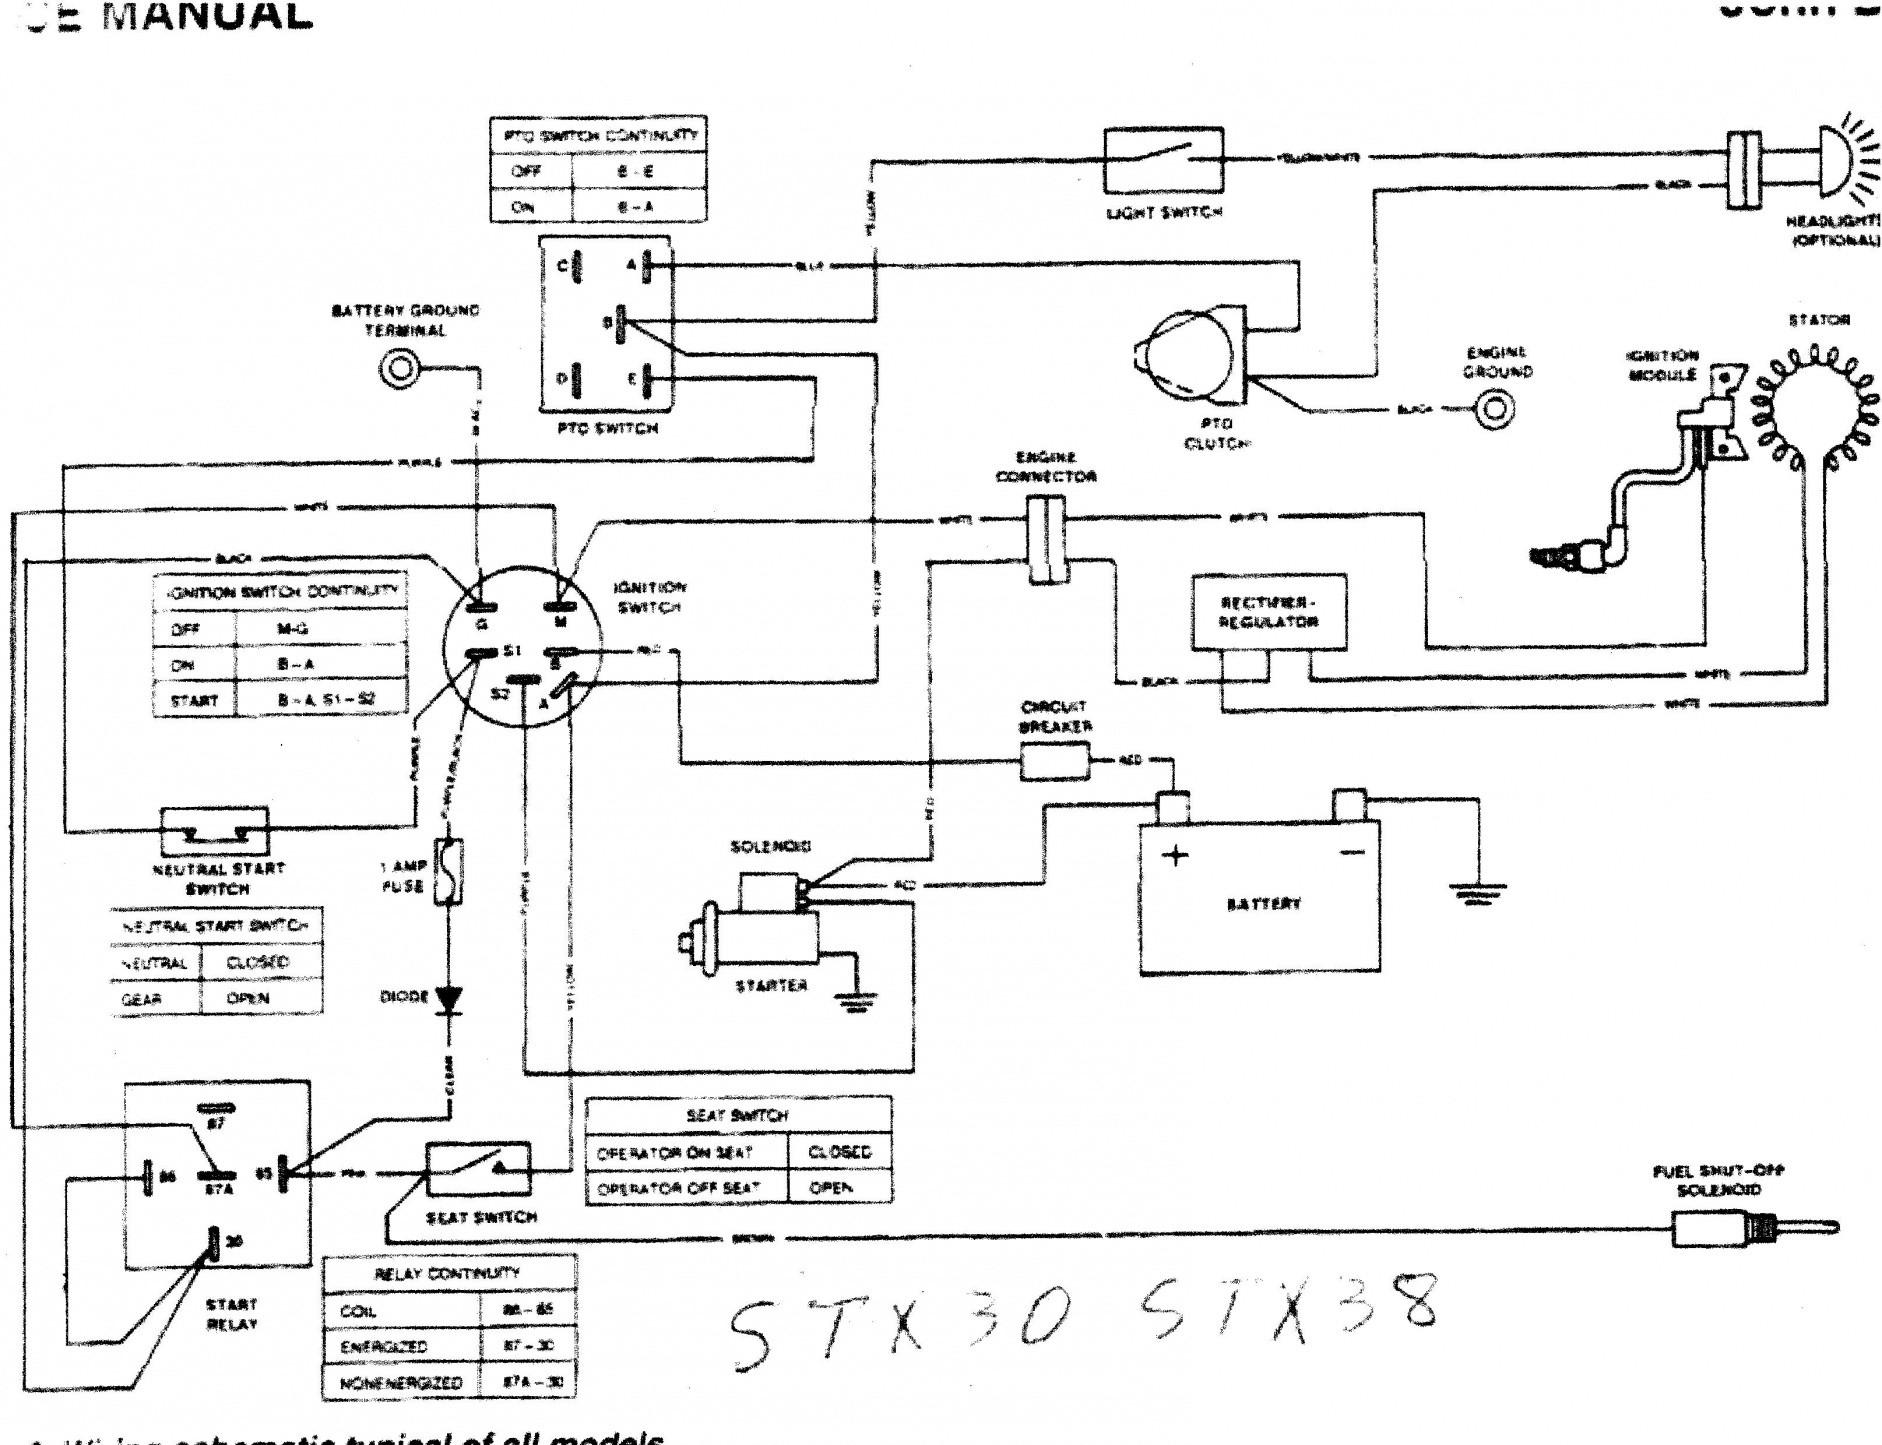 Wireing Diagram for John Deere 345 John Deere Stx38 Problem Need Help Of Wireing Diagram for John Deere 345